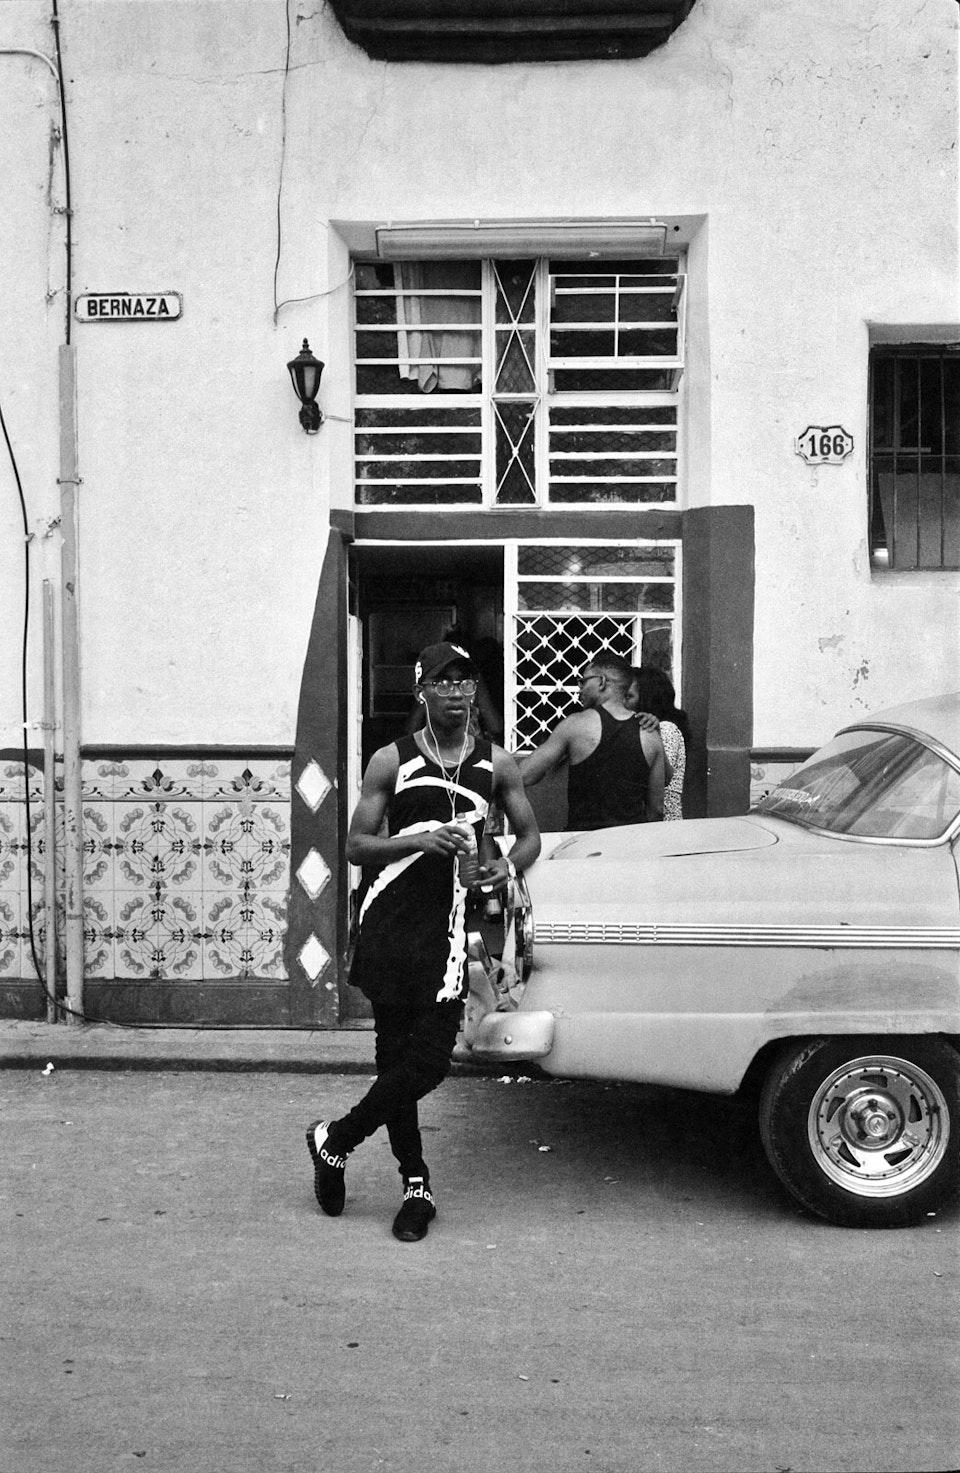 La Habana Cuba_tendy_dude-Edit